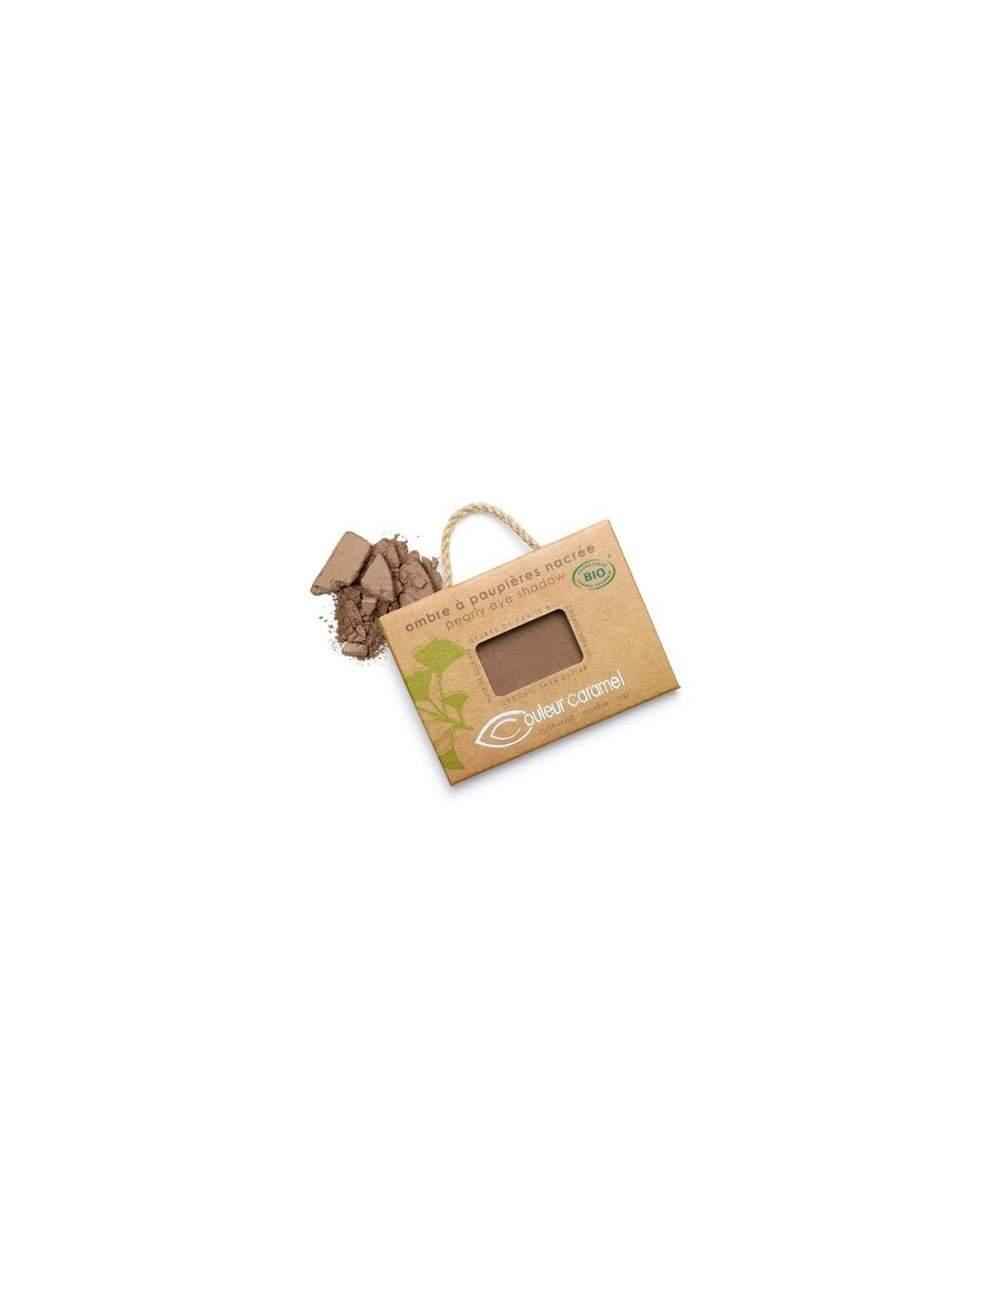 Sombra de Ojos Bio Nacarada 67 Chocolat Cuivre. Couleur Caramel